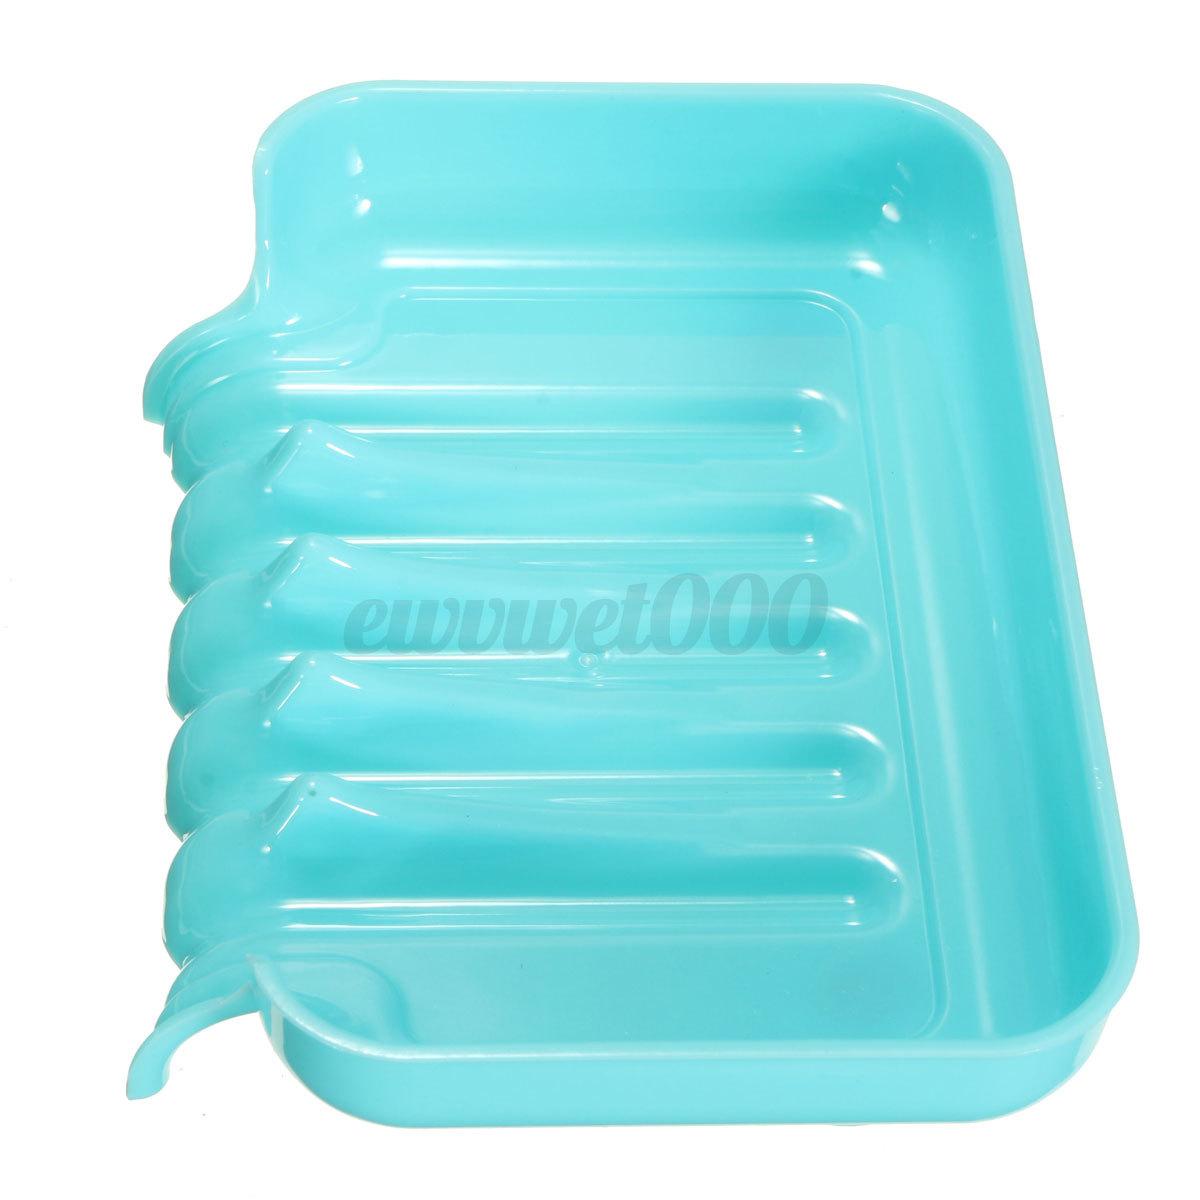 Plastic Bathroom Kitchen Waterfall Drain Soap Dish Sponge Holder Suction Cup Box Ebay